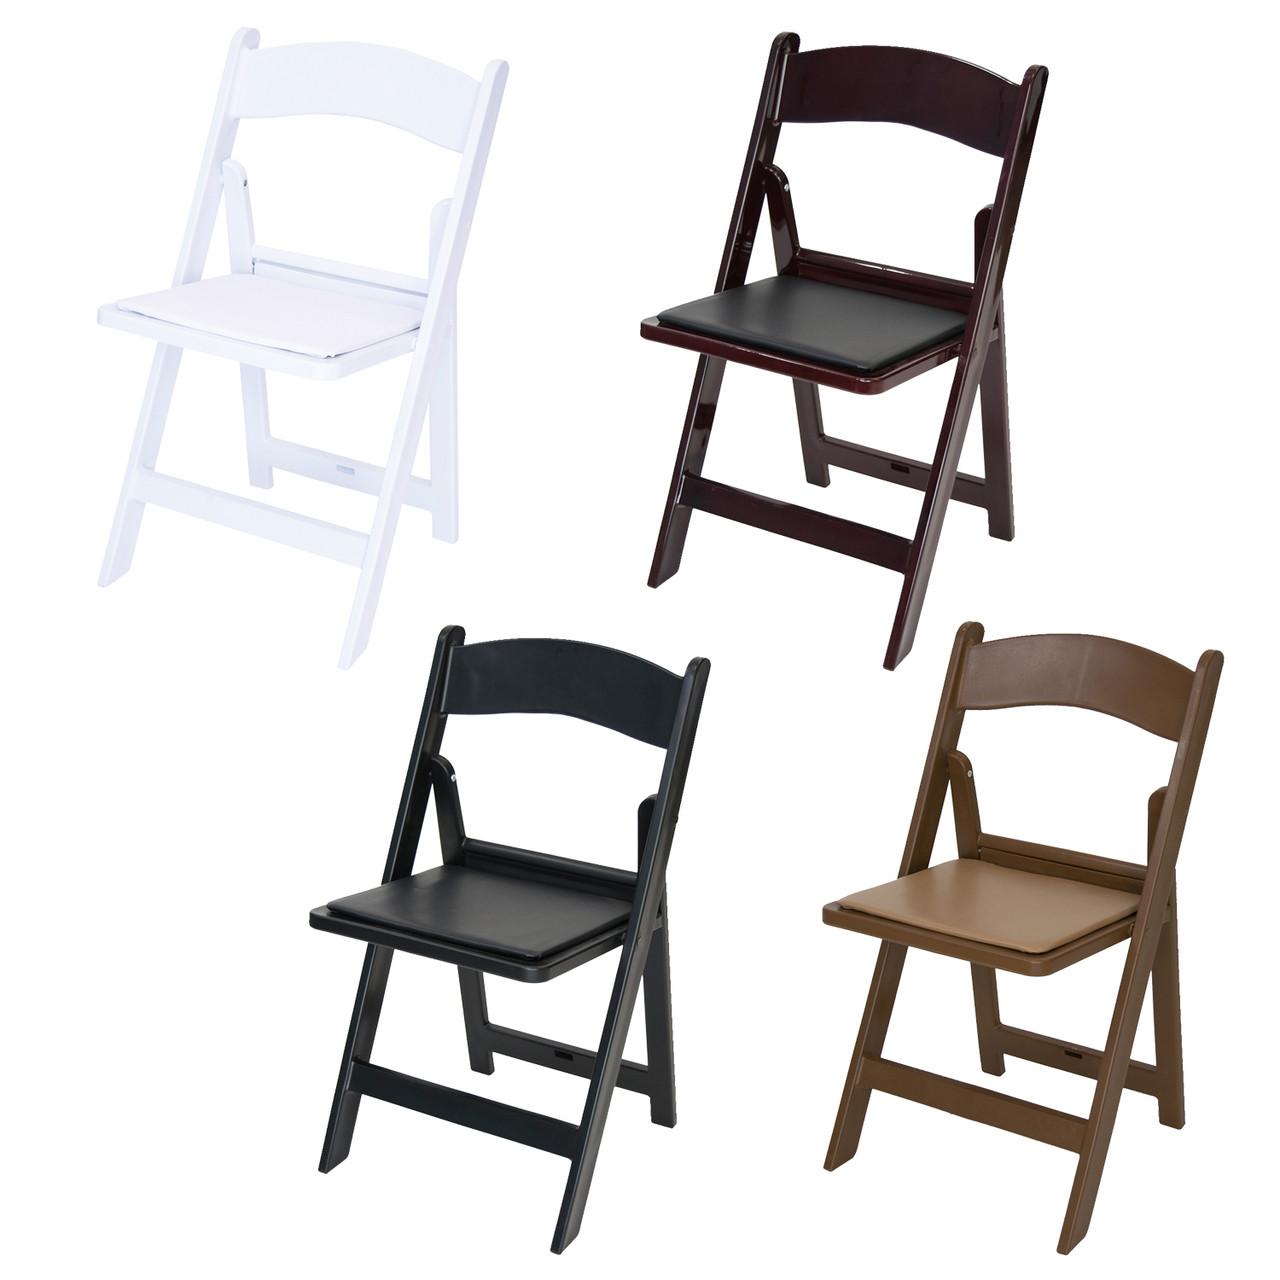 Classic Series Resin Folding Chair 1000 Lb Capacity Wedding Garden Style